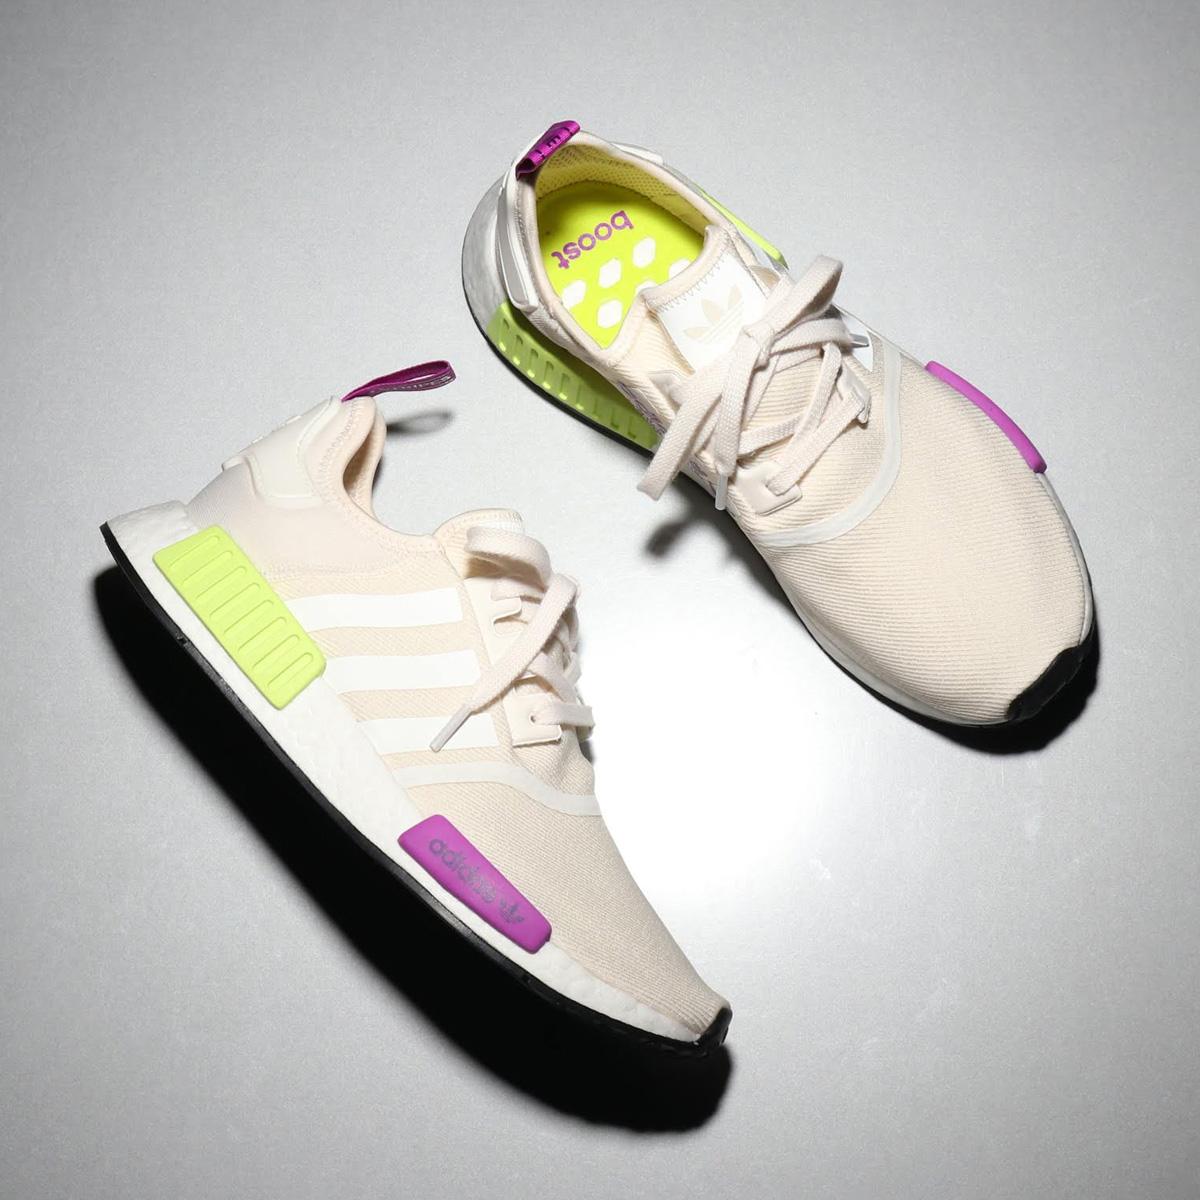 adidas Originals NMD_R1(アディダス オリジナルス エヌエムディーR1)CHALK WHITE/CHALK WHITE/SEMI SOLAR YELLOW【メンズ レディース スニーカー】18FW-I